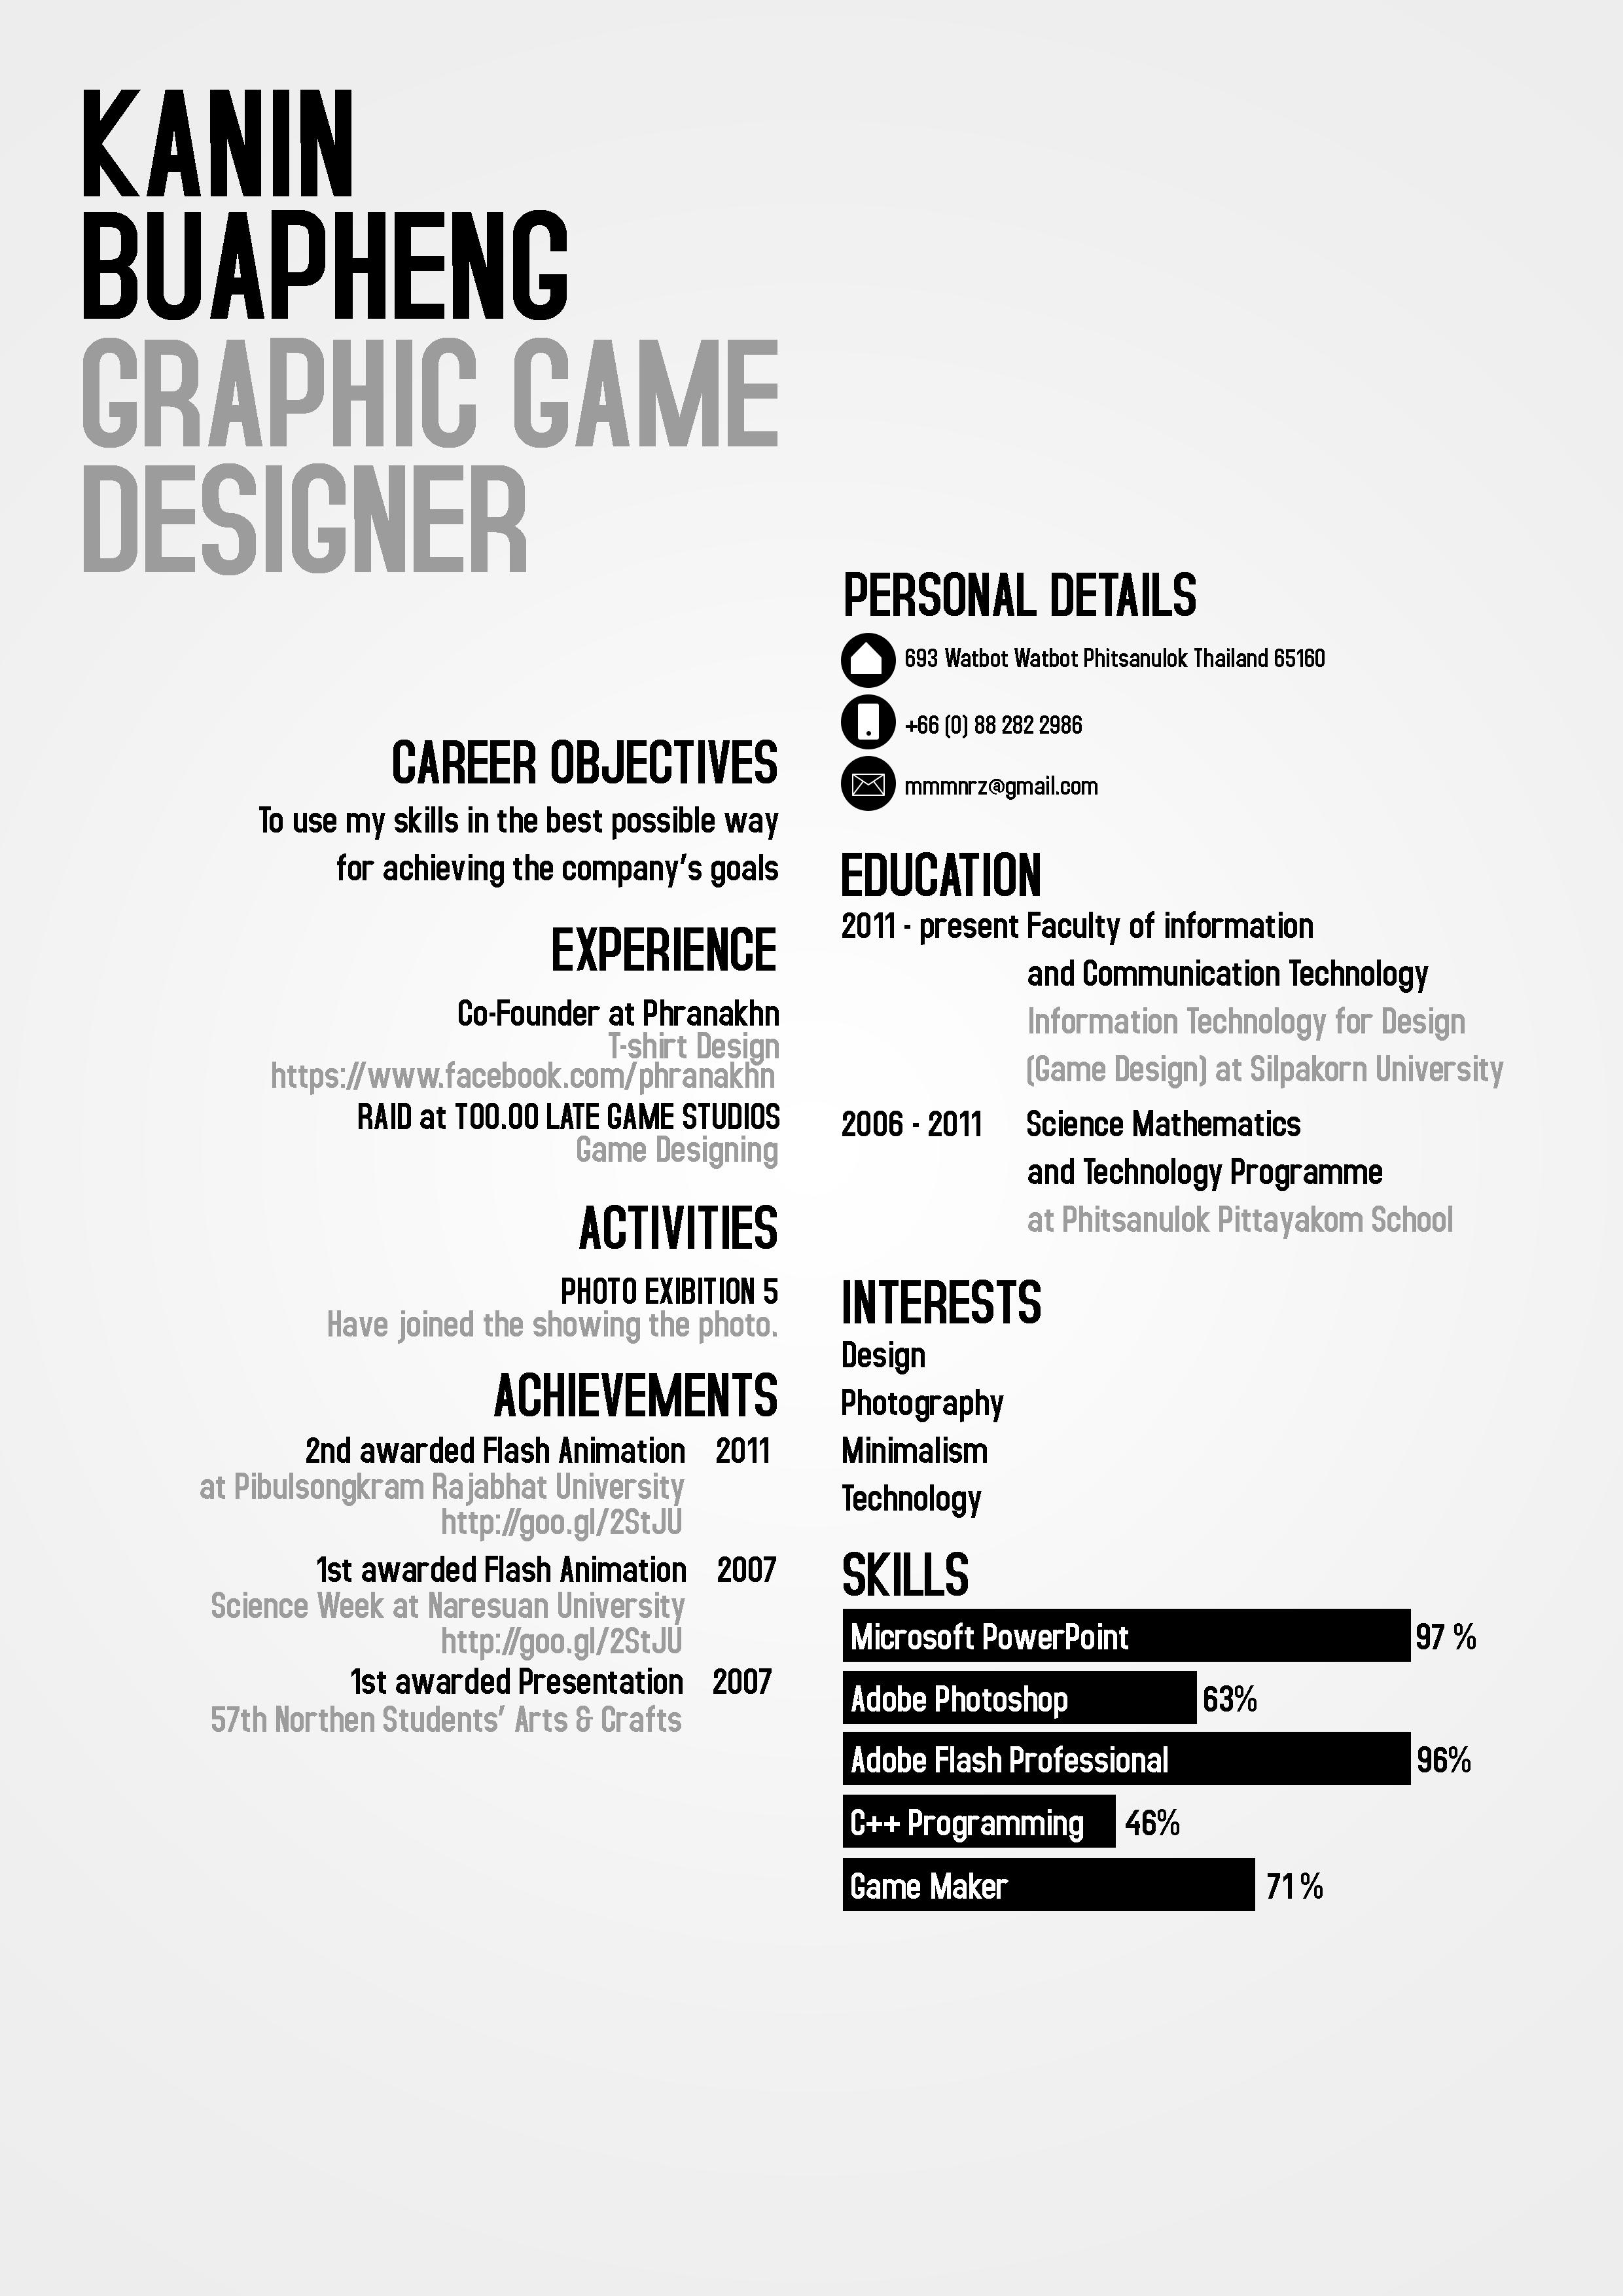 Curriculum Vitae Kaiennetaro Wiztheme Mmmnrz Picto Resume Design Creative Cv Design Resume Design